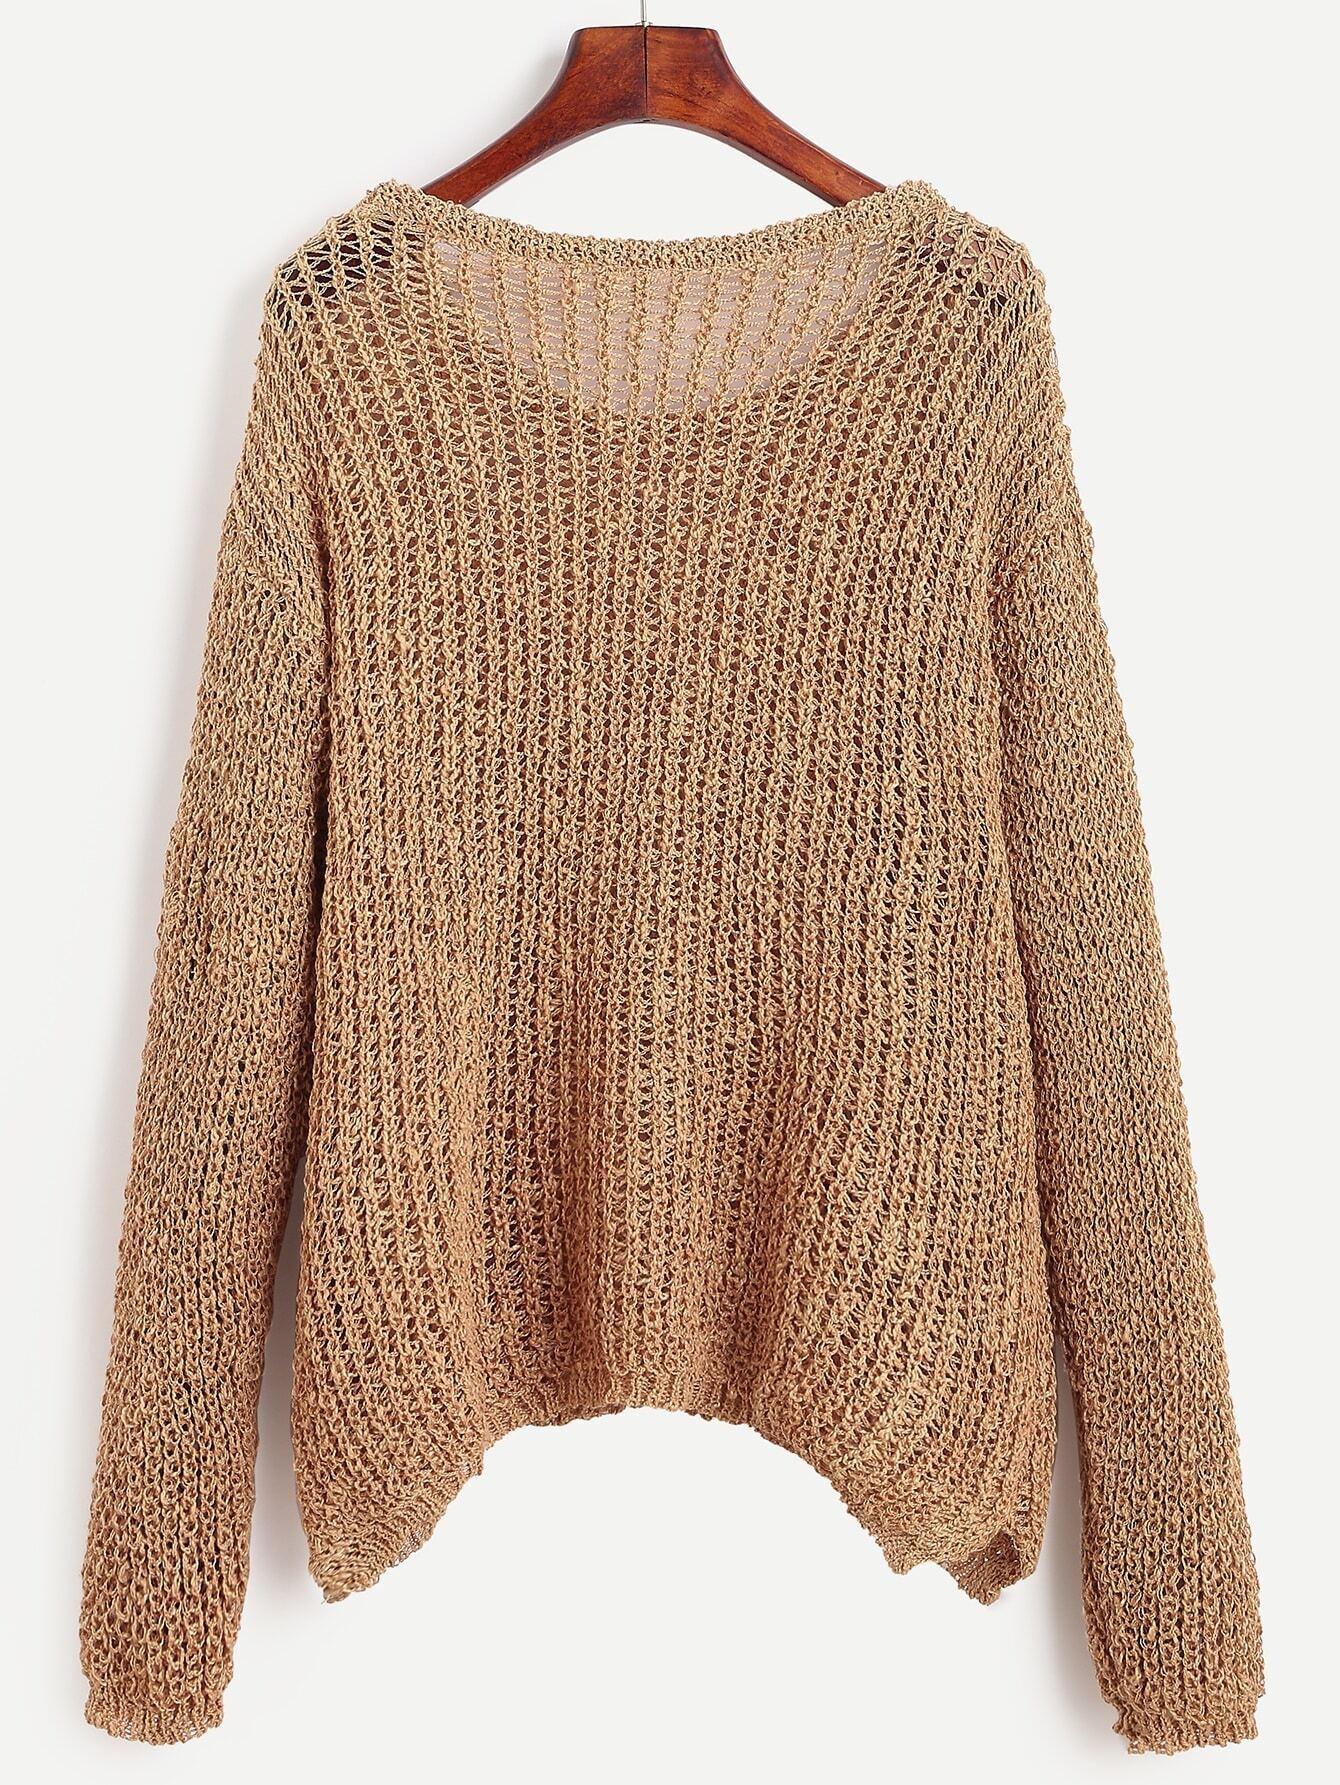 sweater160816023_2